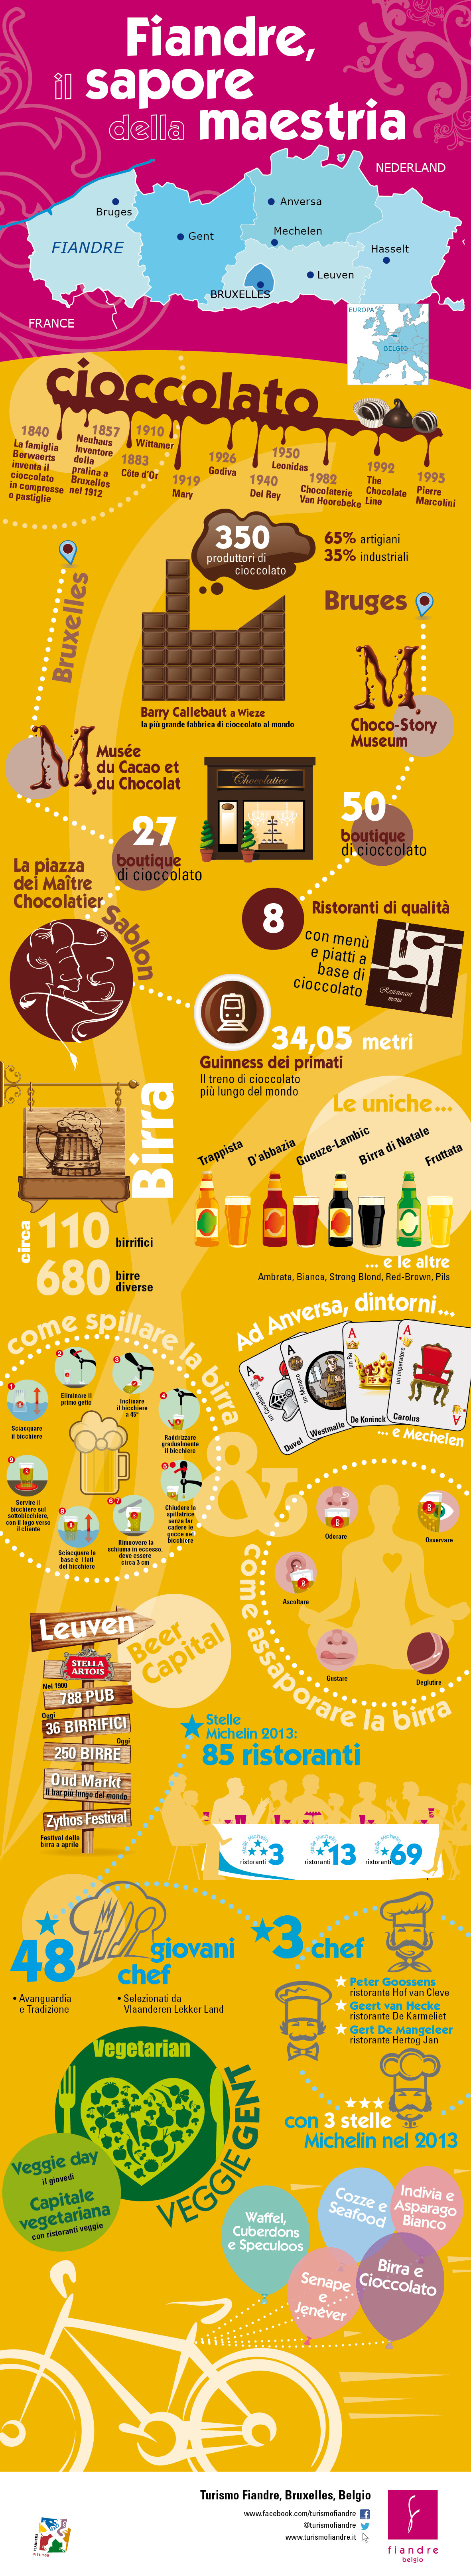 #fiandre #food #gastronomia #IG2013